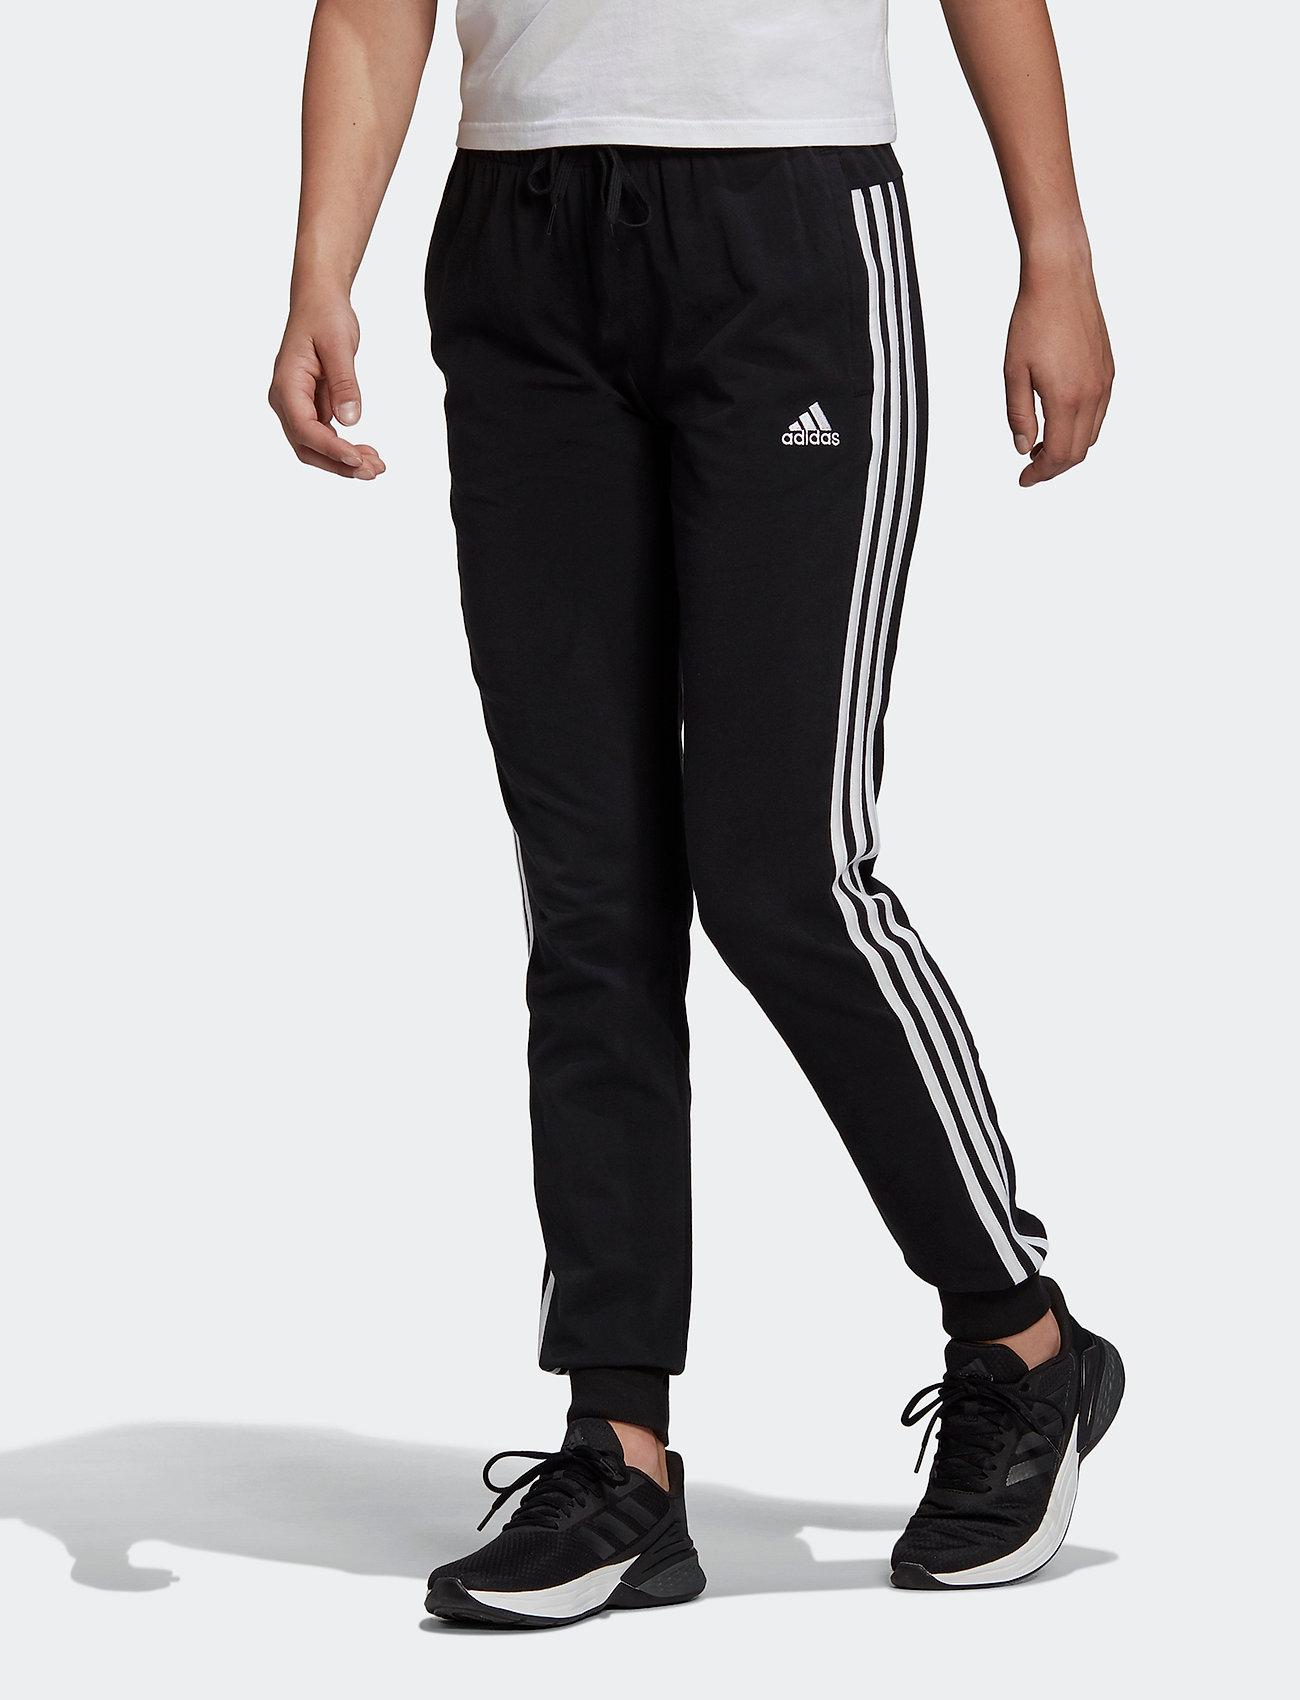 adidas Performance Essentials Single Jersey 3-stripes Pants W ...